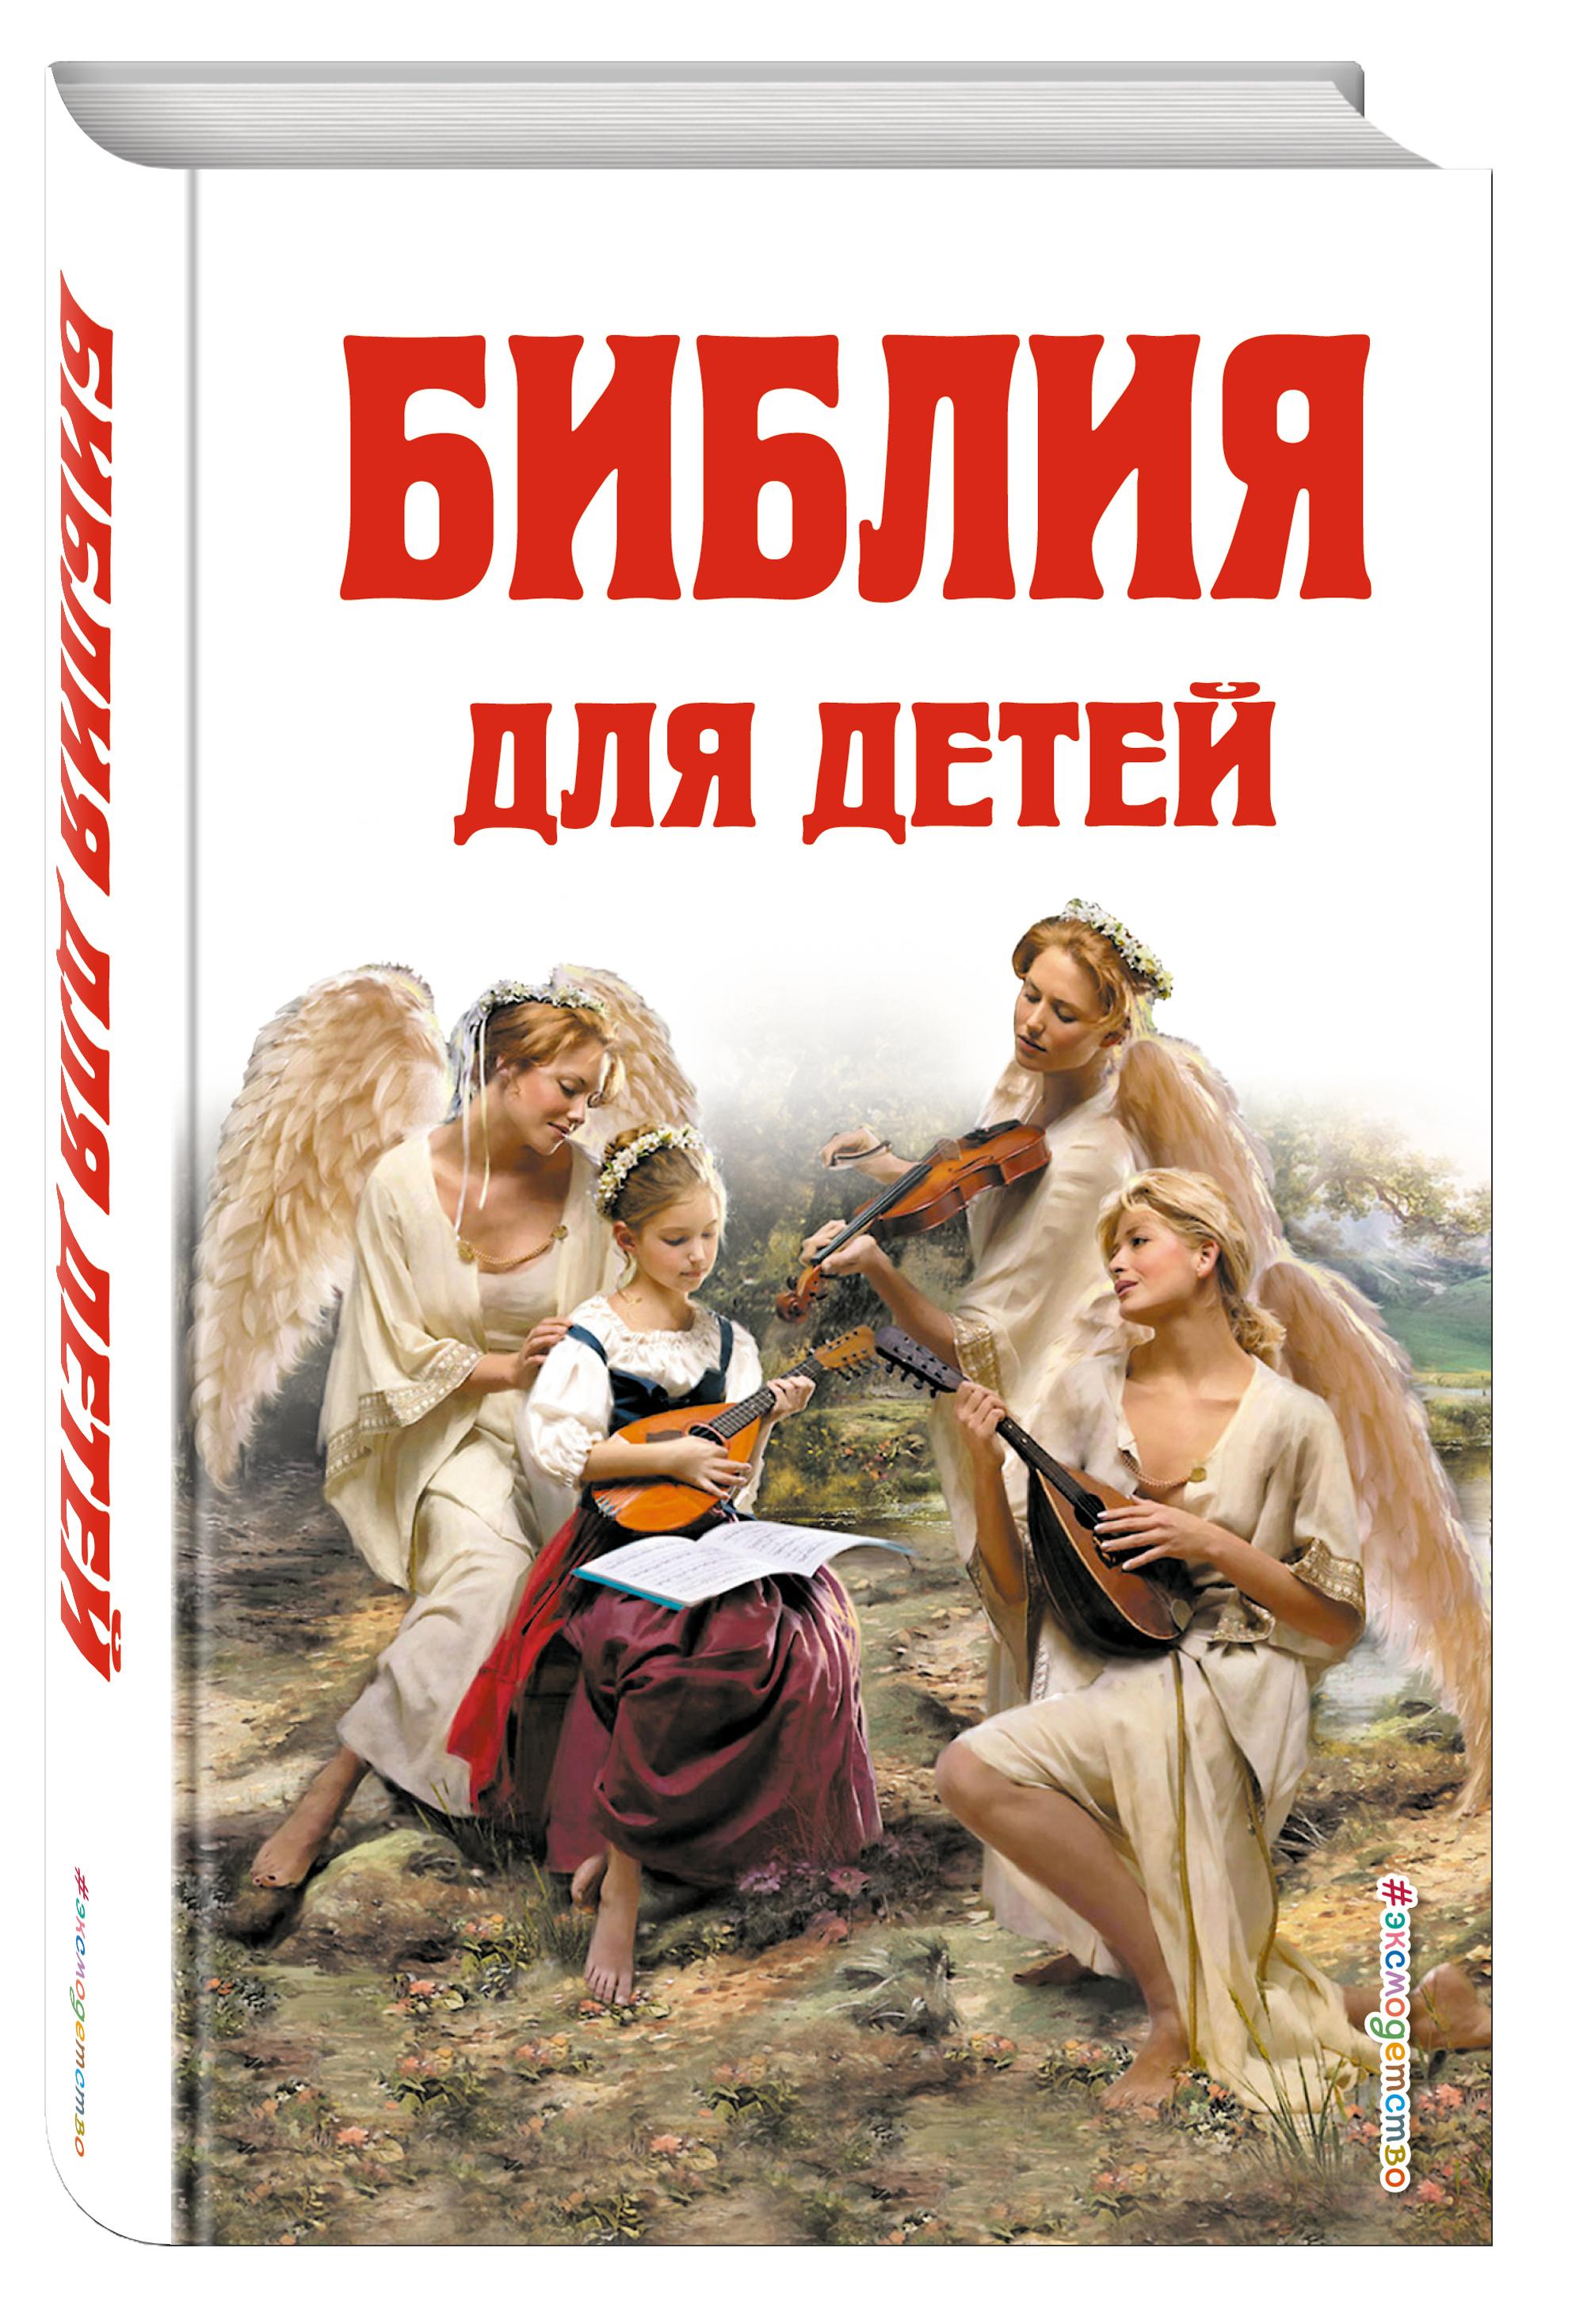 Библия для детей glaser d36440 00 glaser